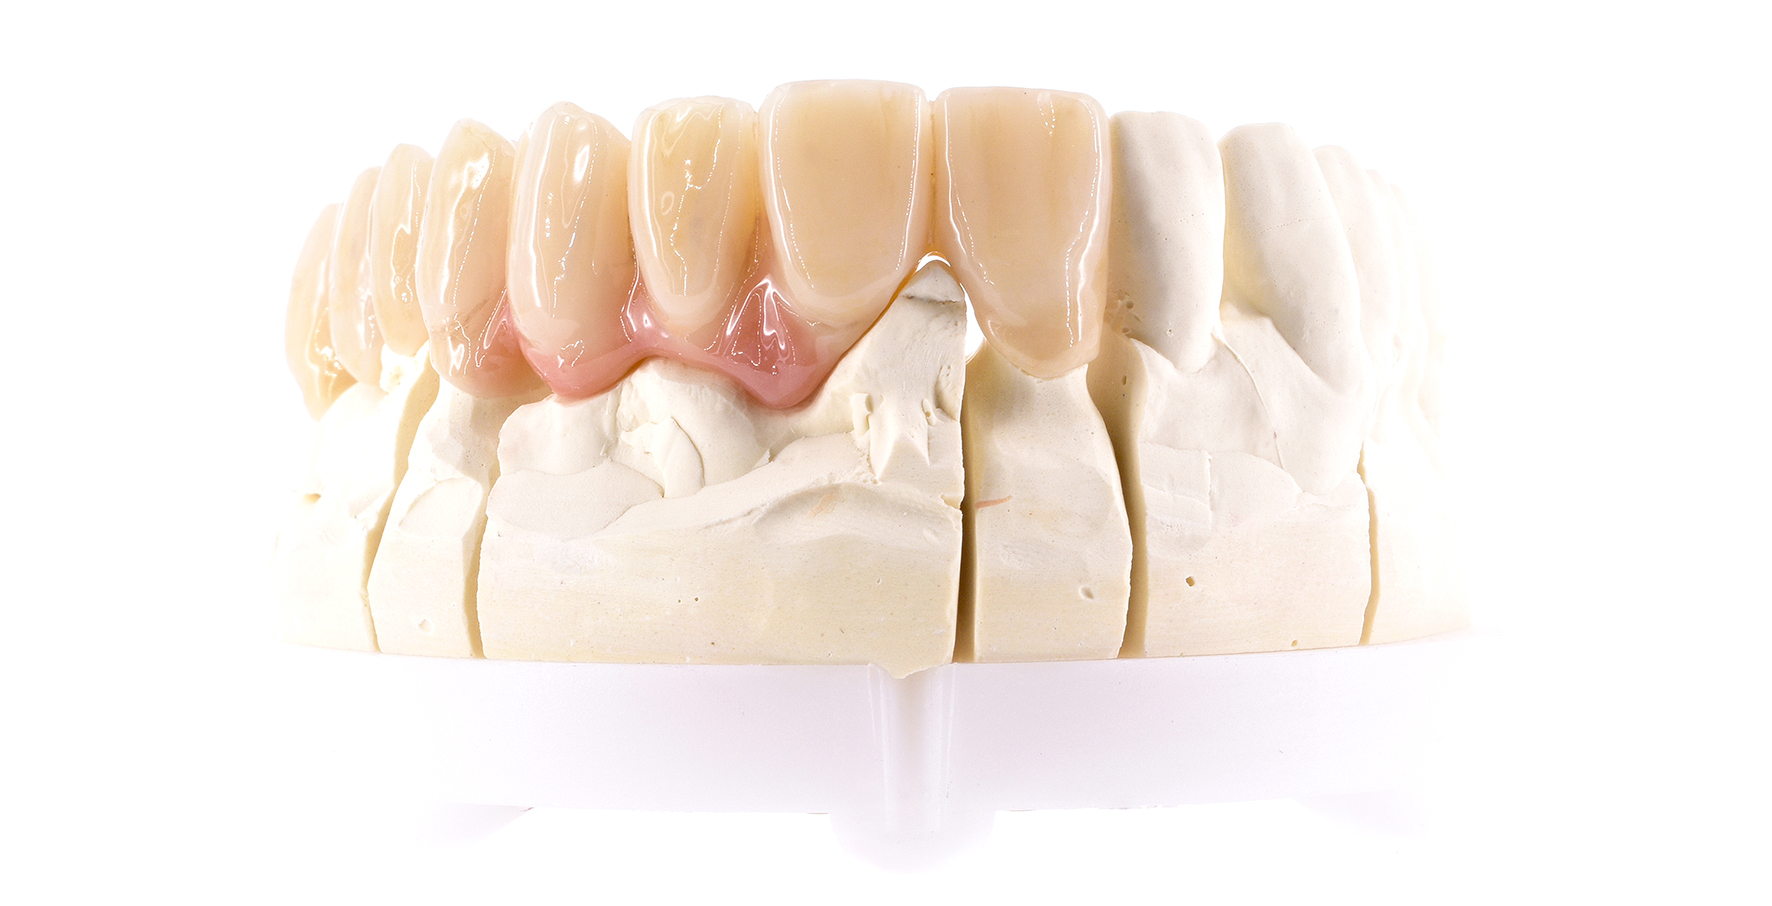 Zro2-Digital-Dental-zahnersatz-1